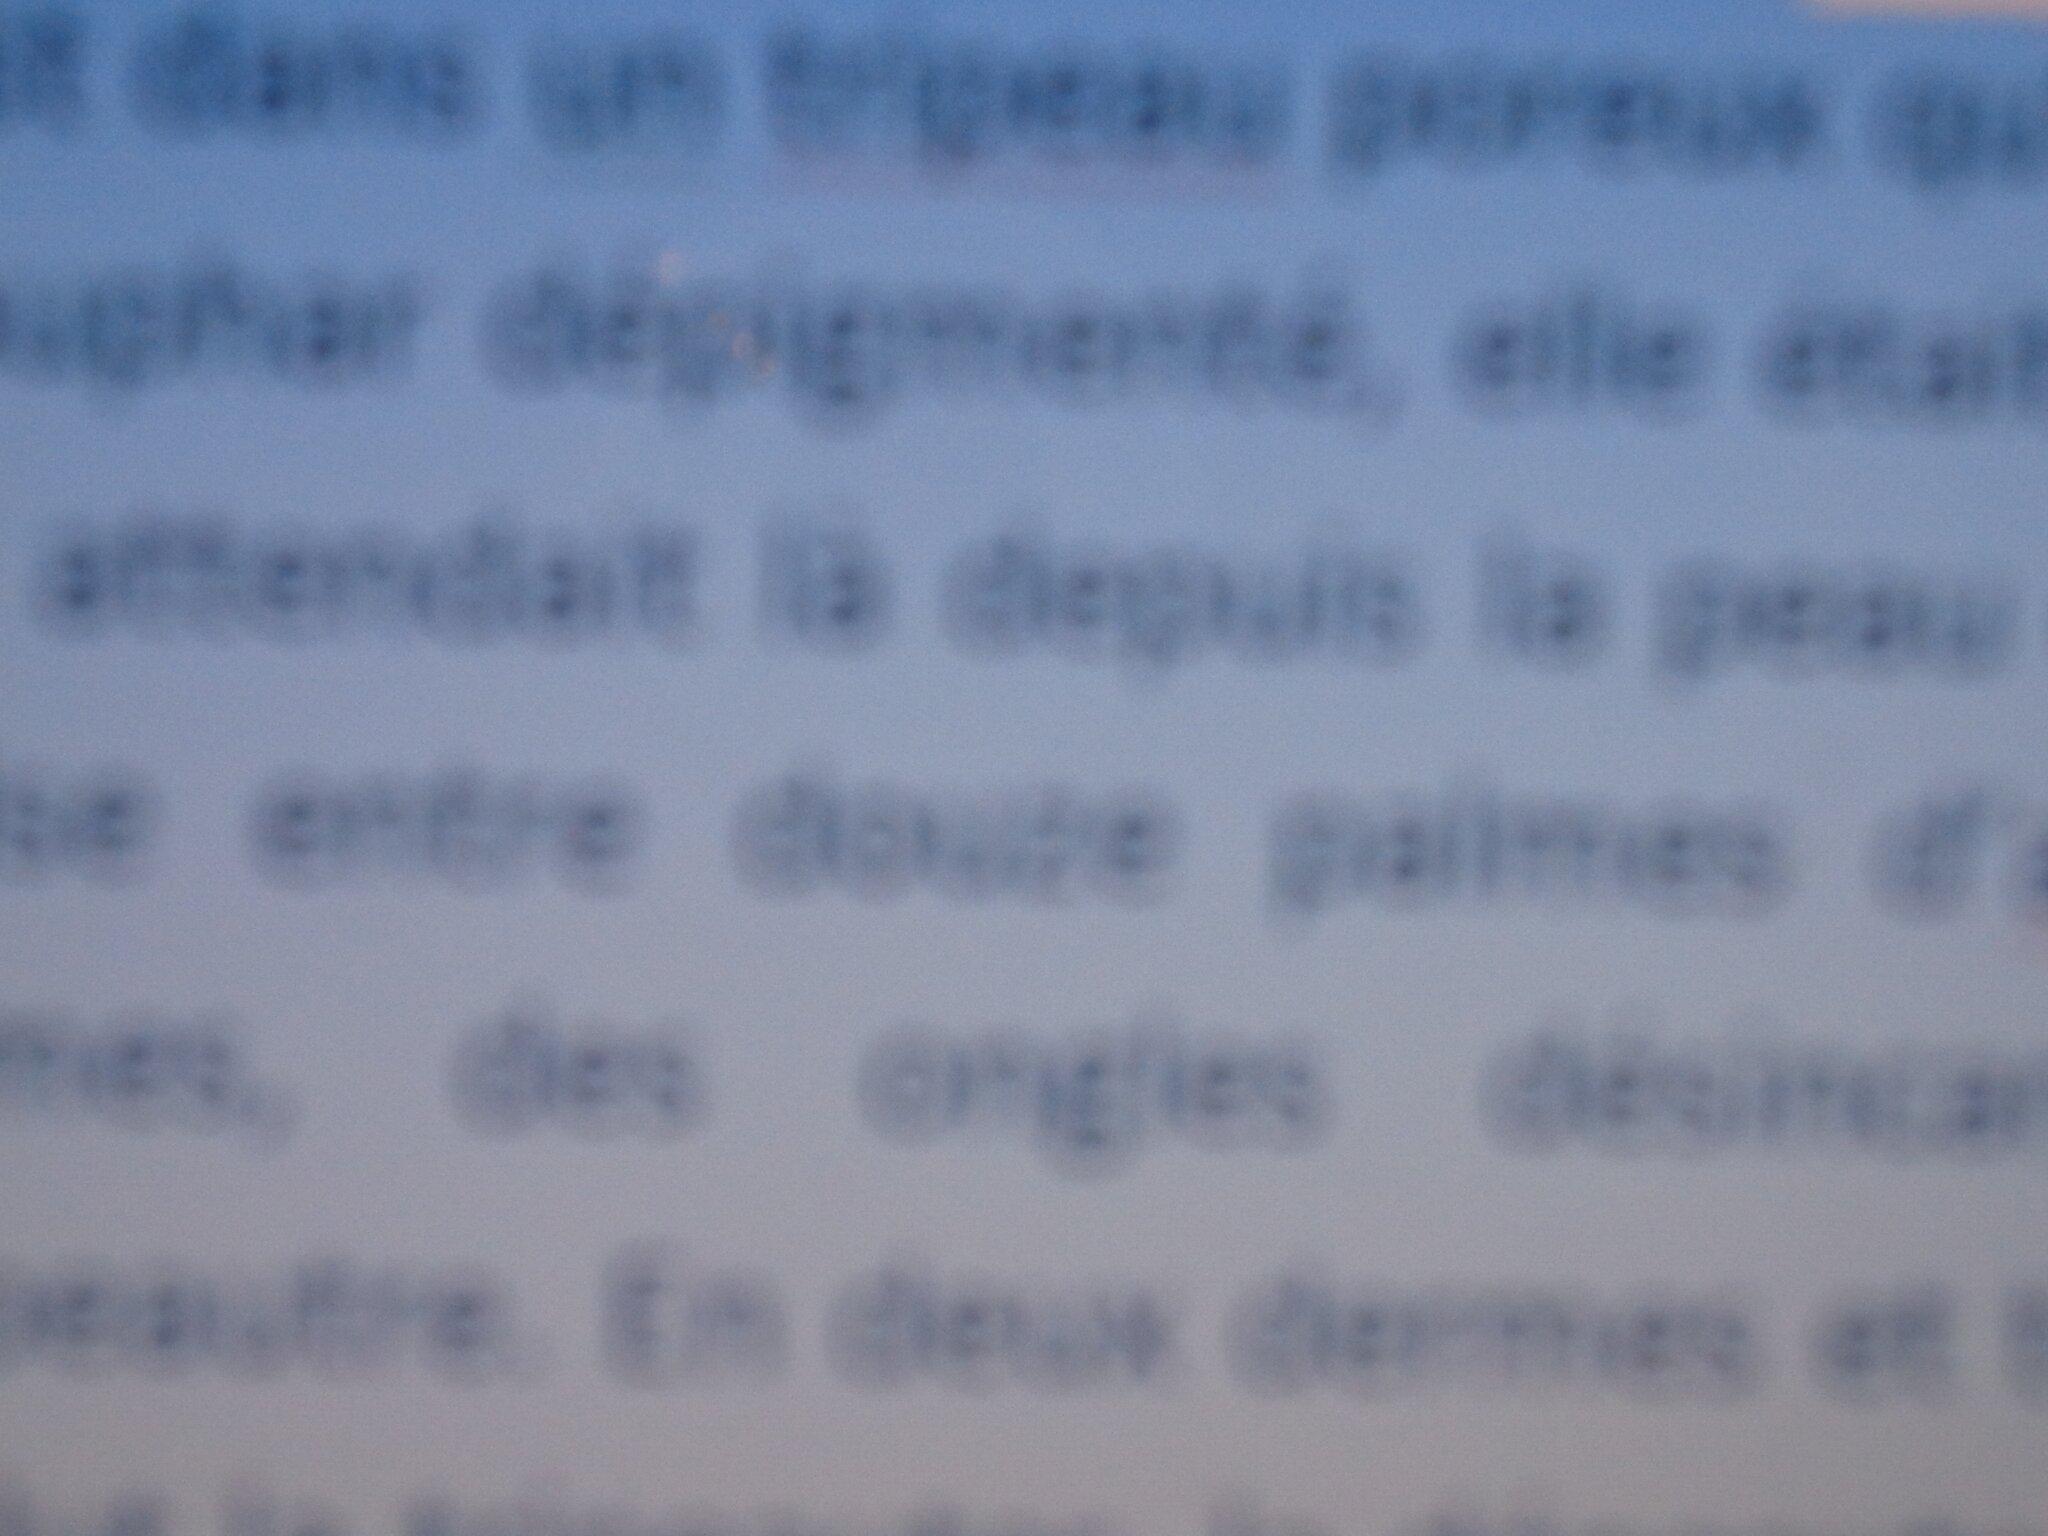 Histoire de peau, C.-L. Desguin